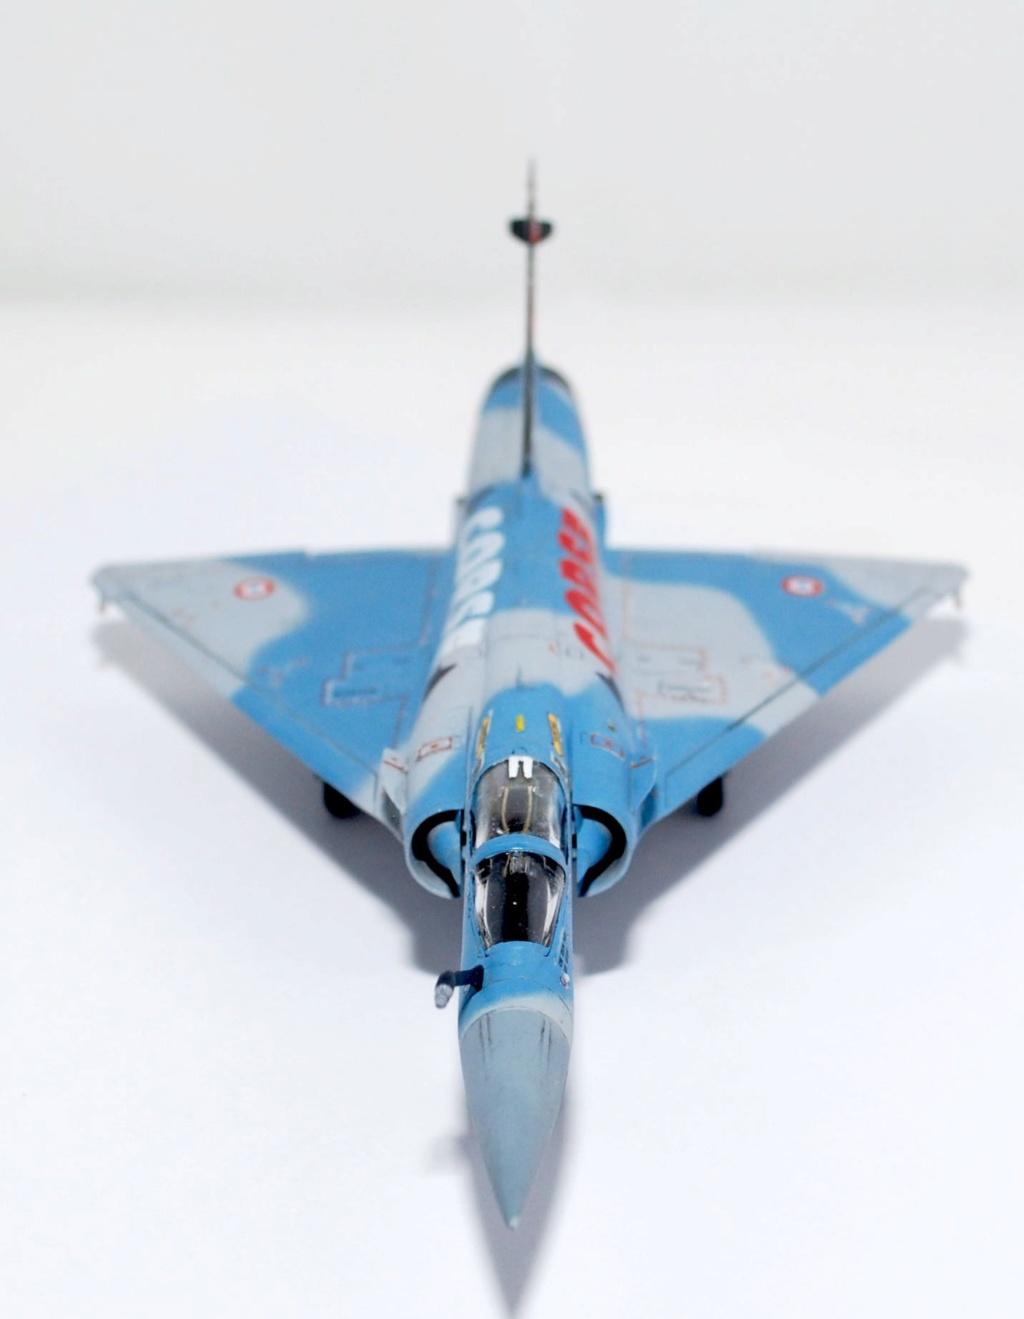 Mirage 2000-5F, 75ans EC 3/11 Corse, Heller 2000-524